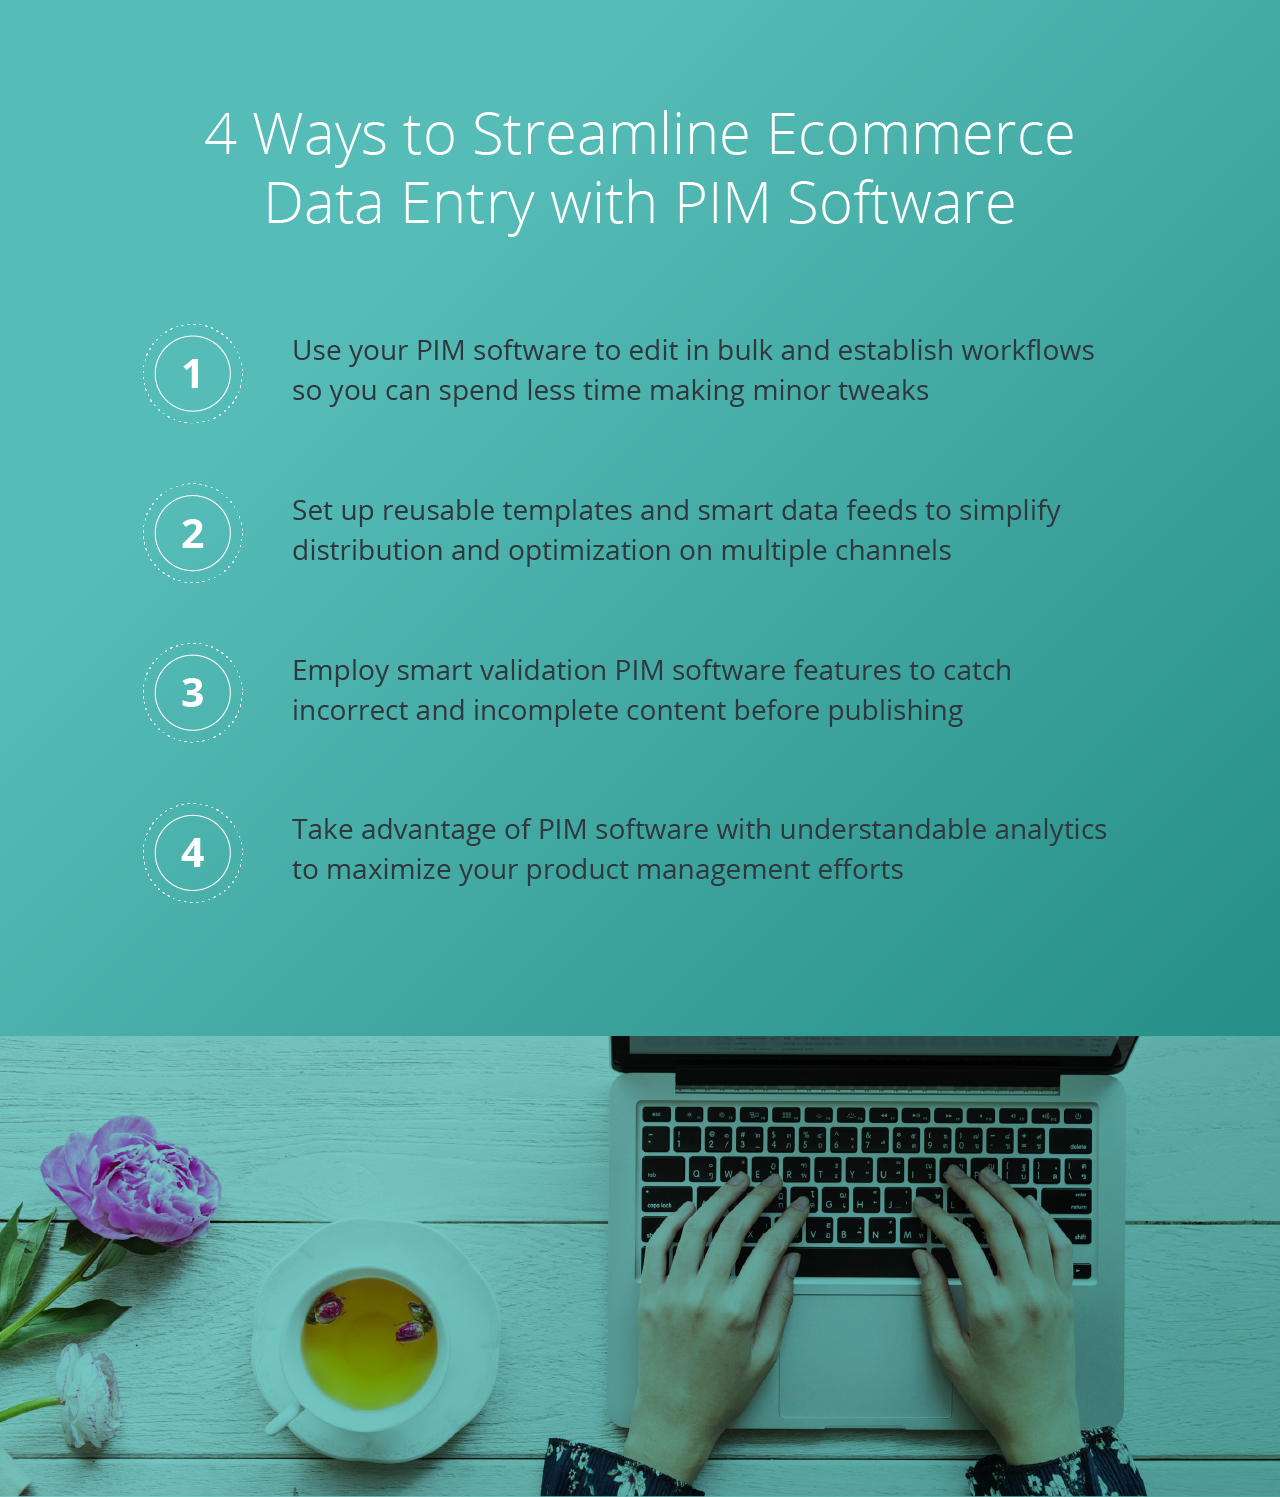 Streamline Ecommerce Data Entry